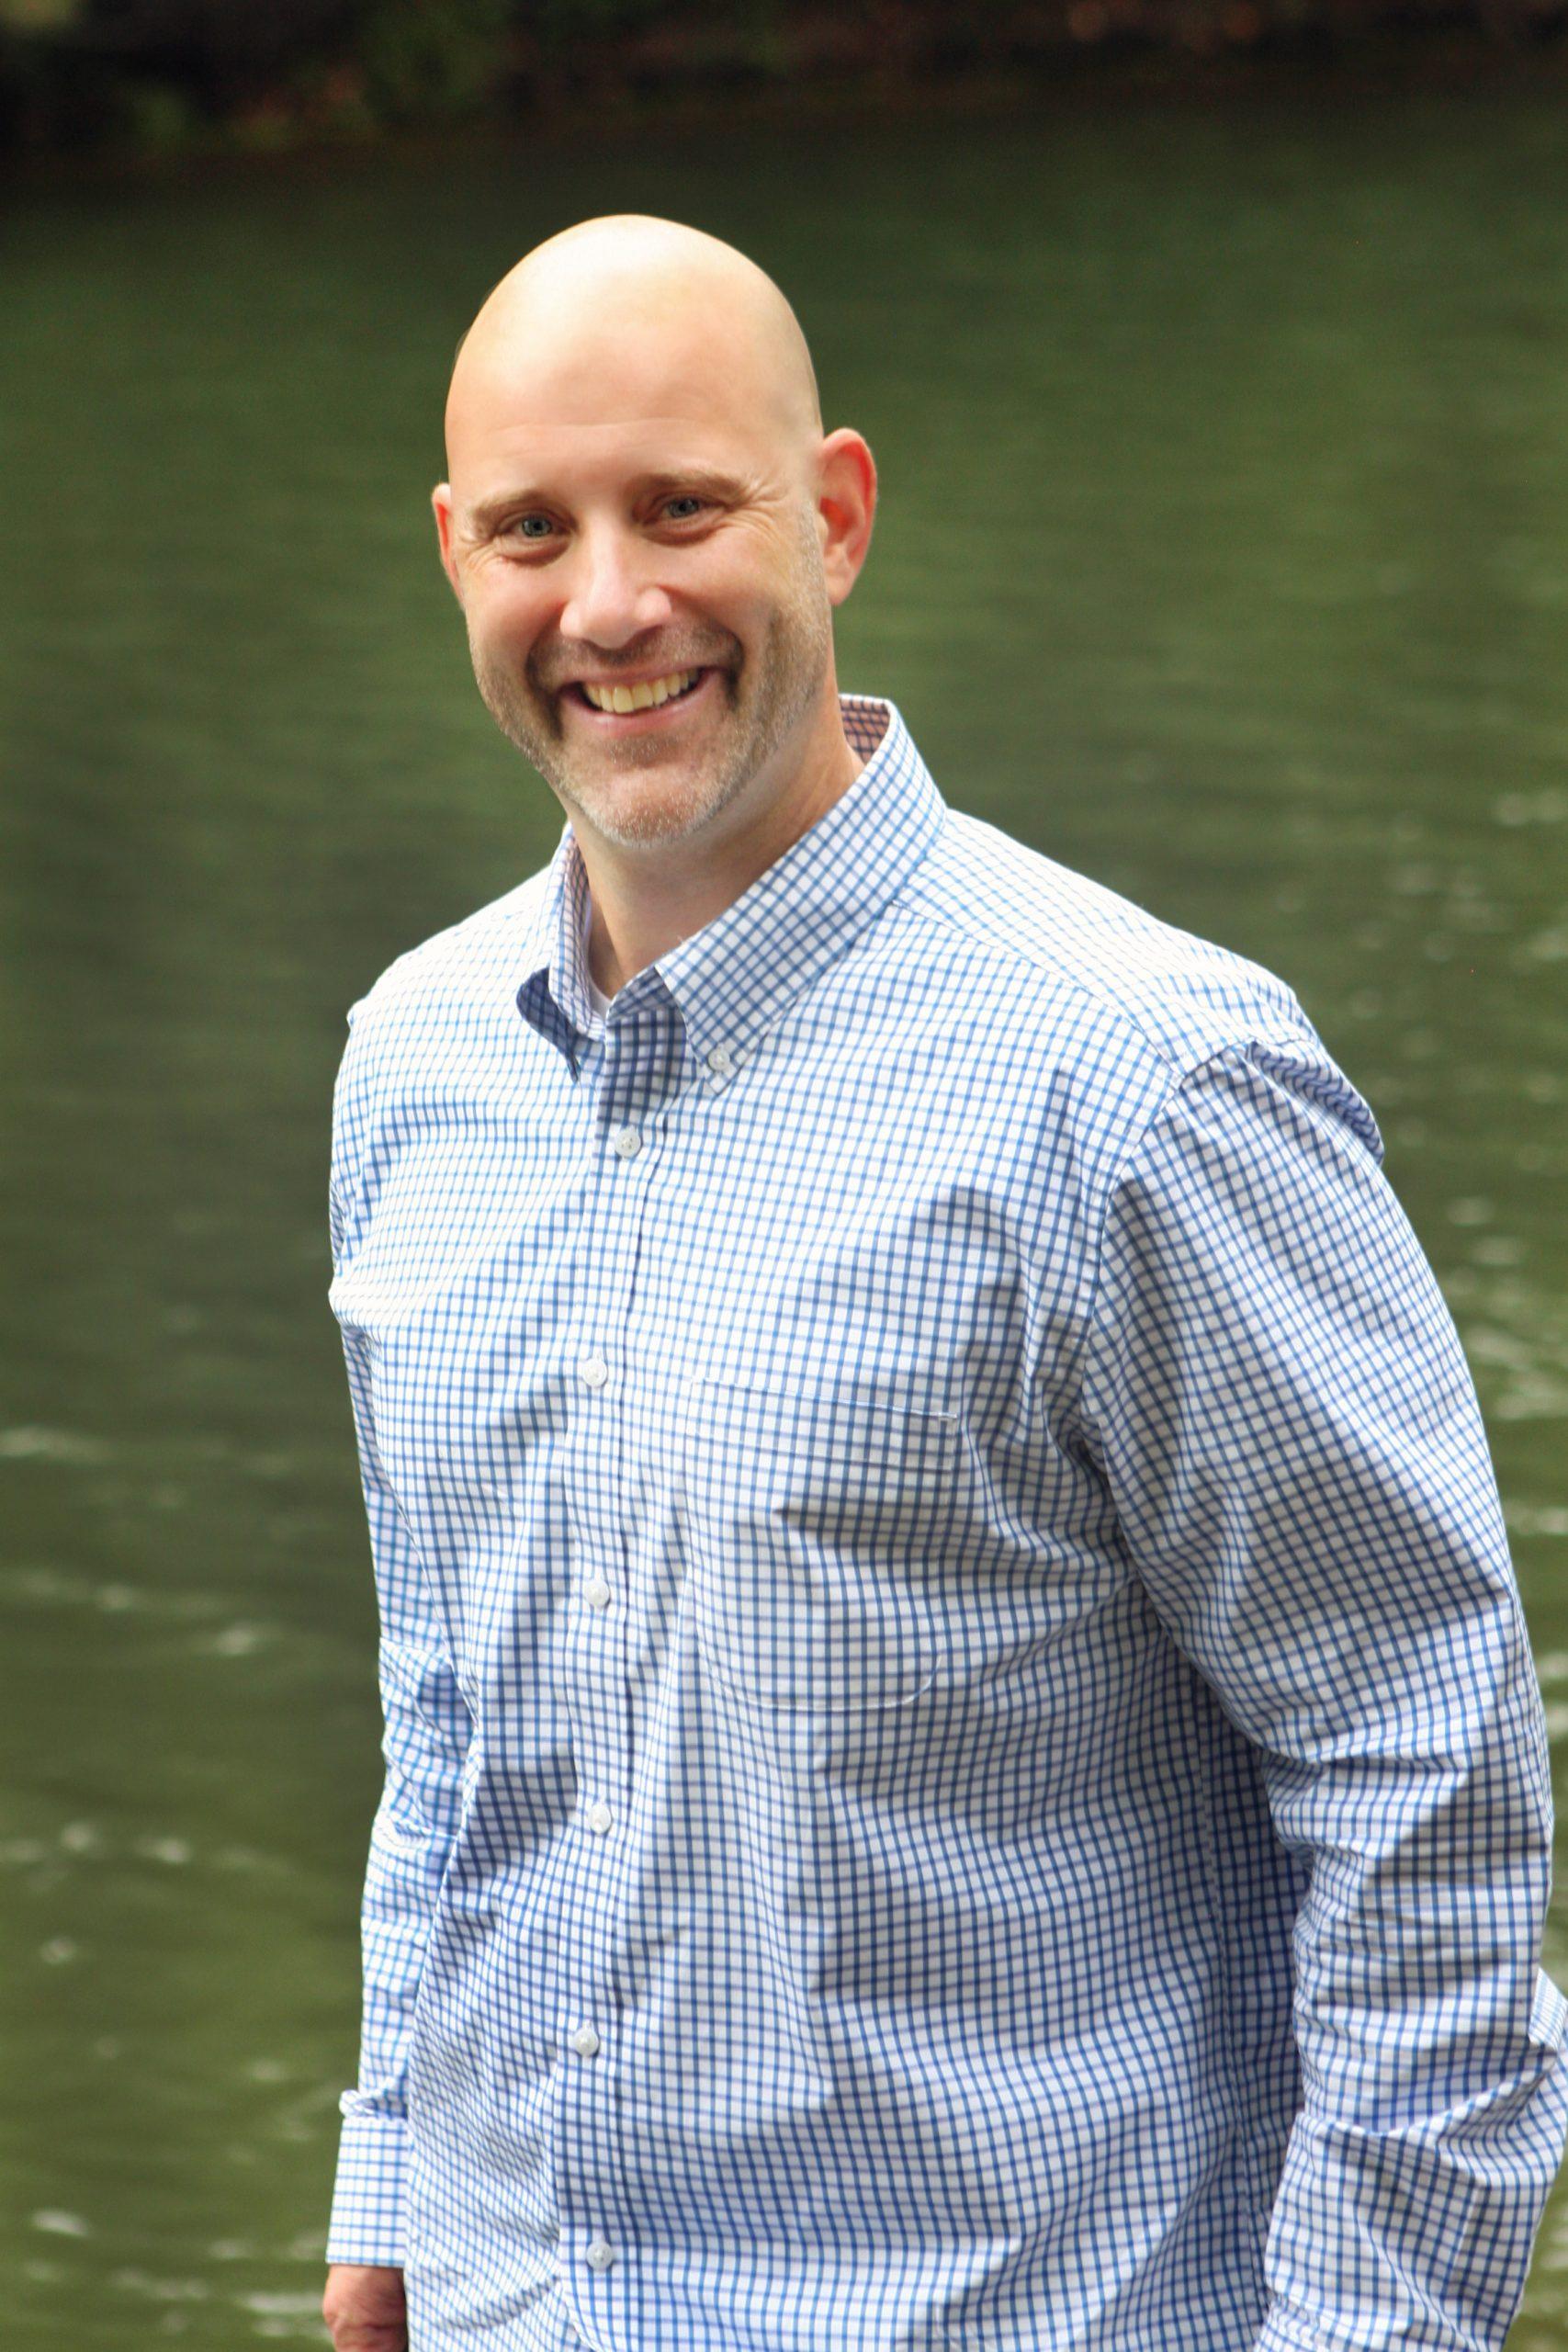 Our Pastor: Nate Parsekian